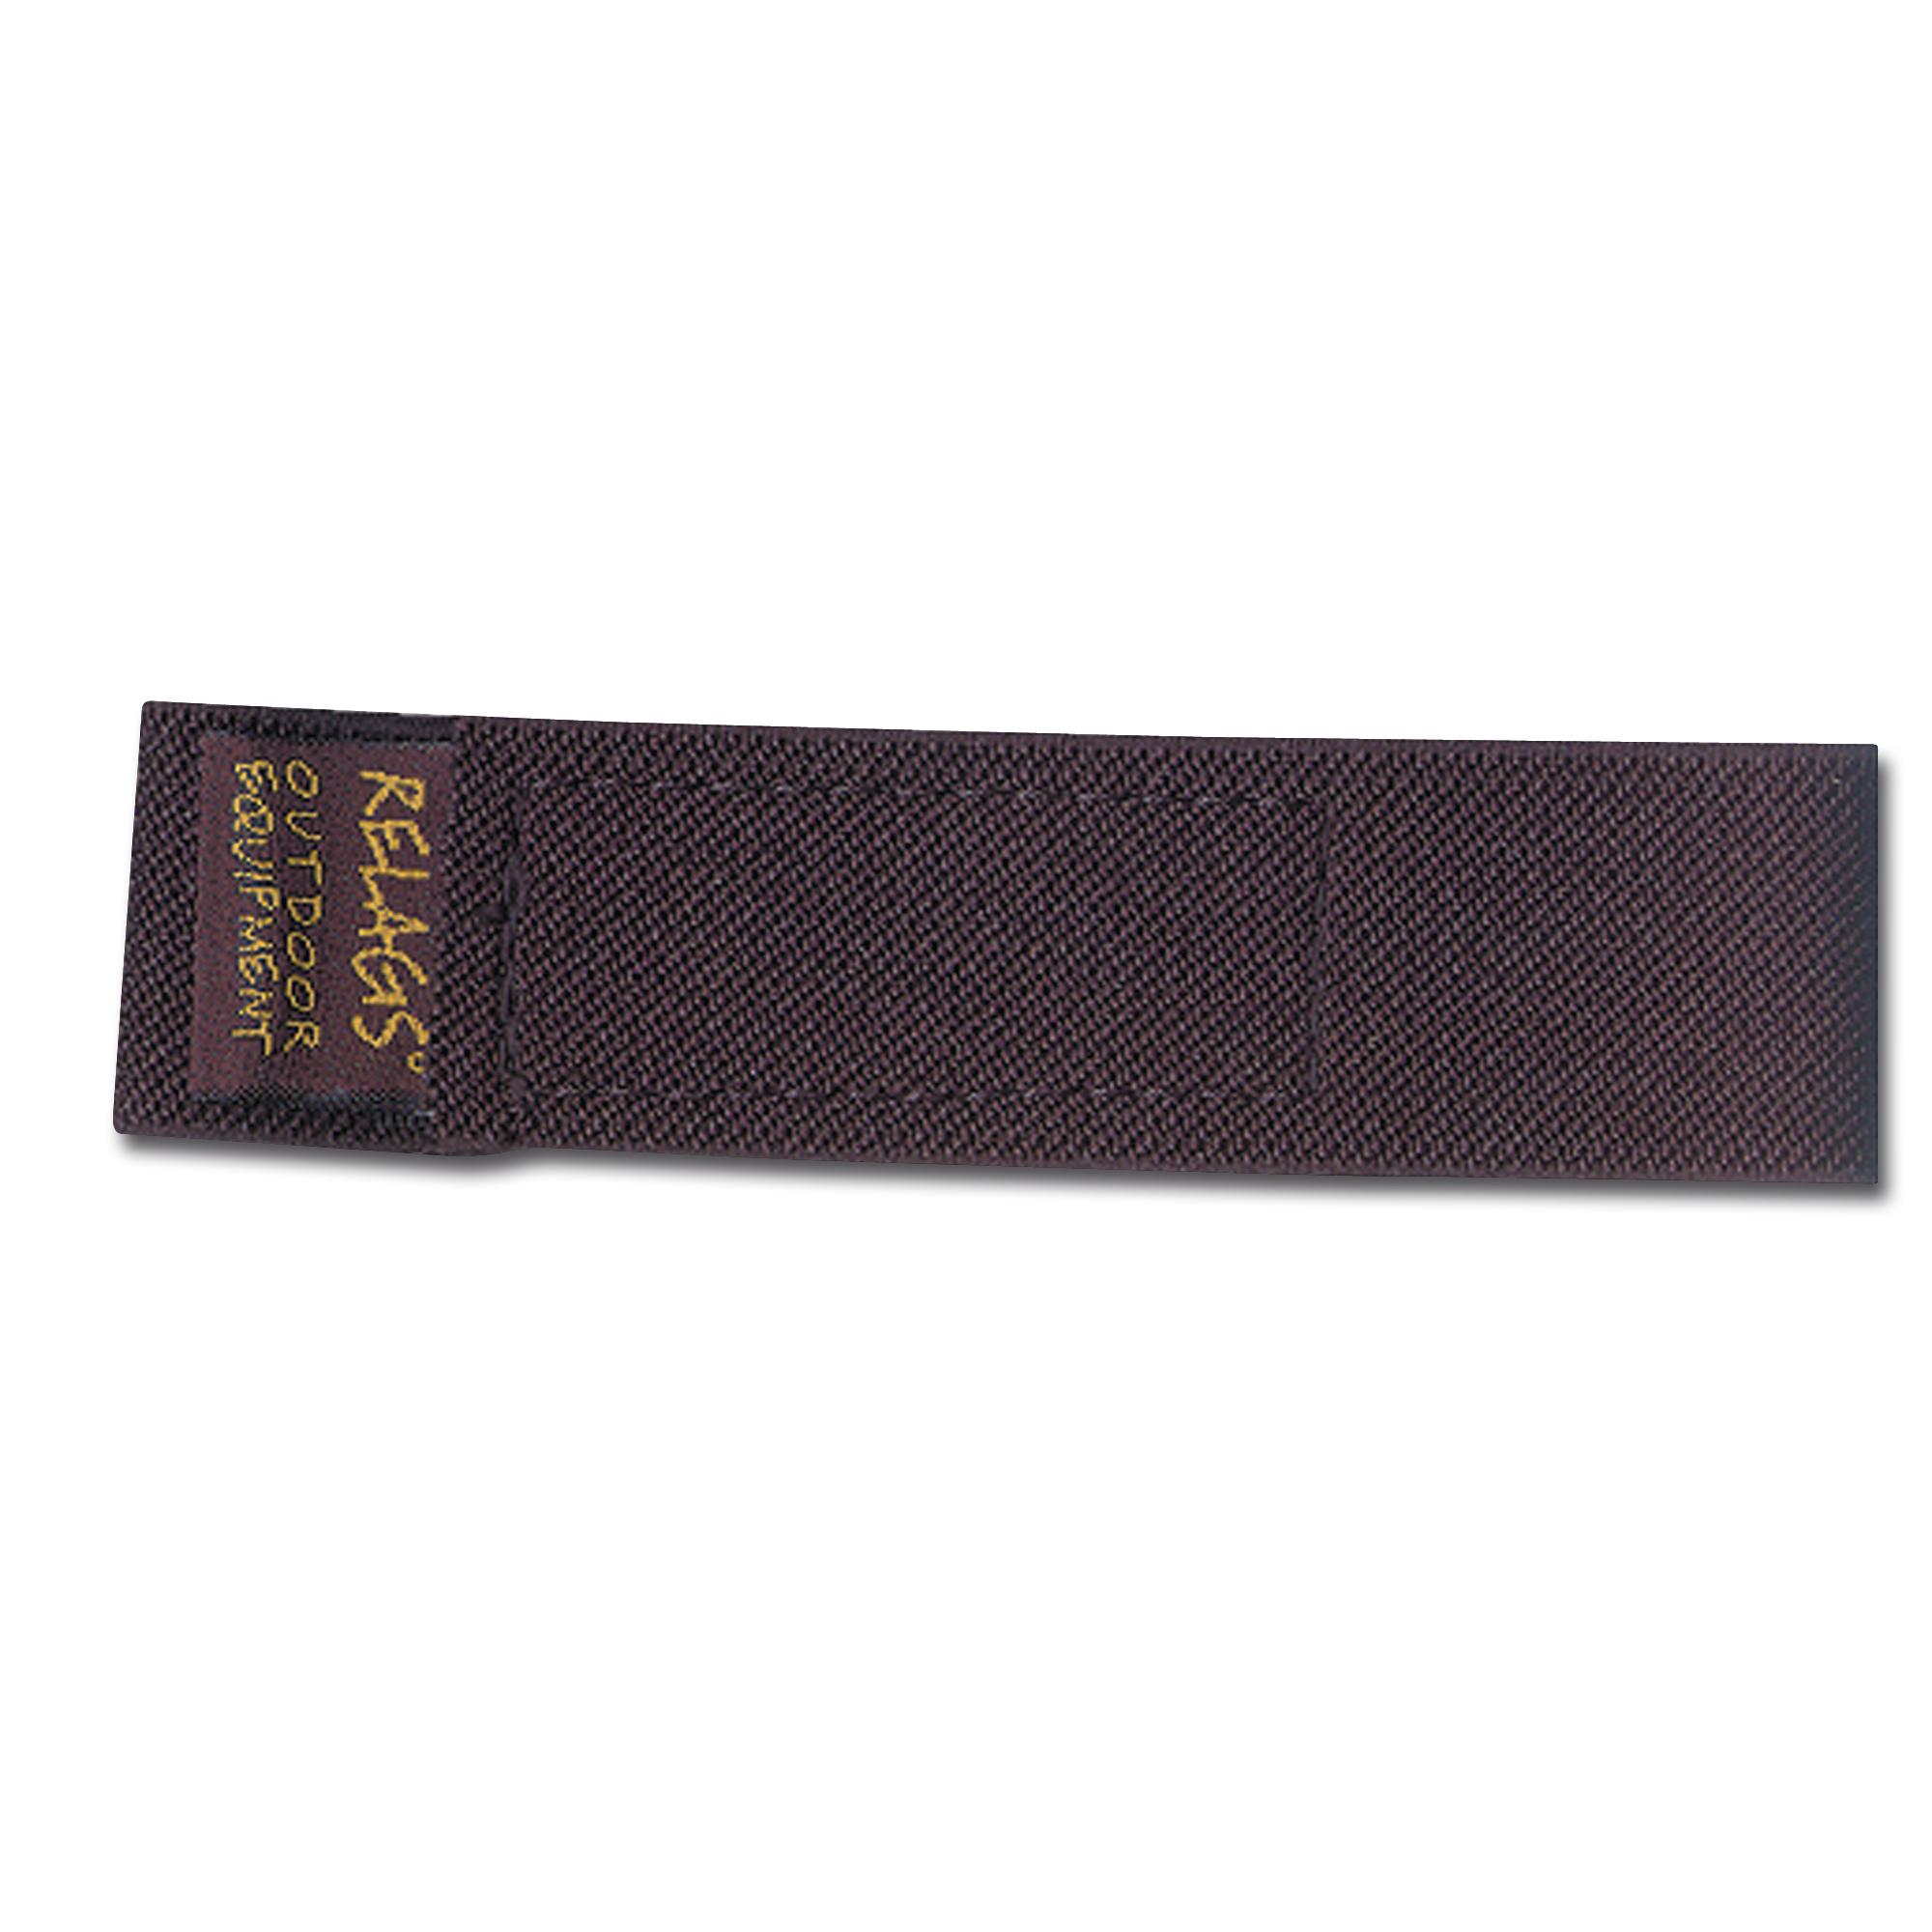 Bandas Strapits negro 30 cm